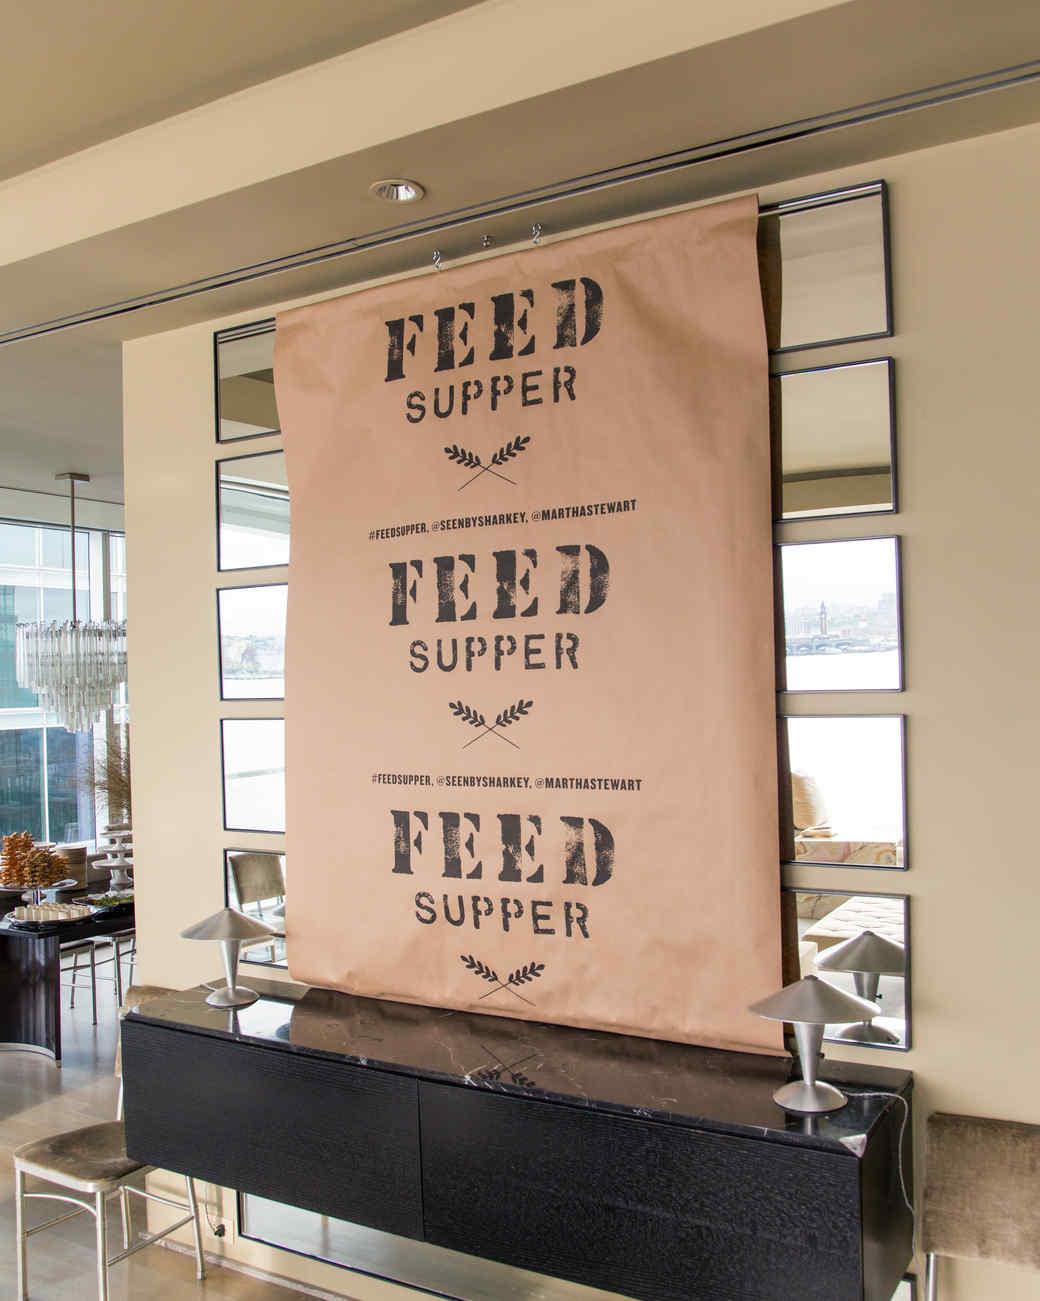 feed-supper-4-1015.jpg